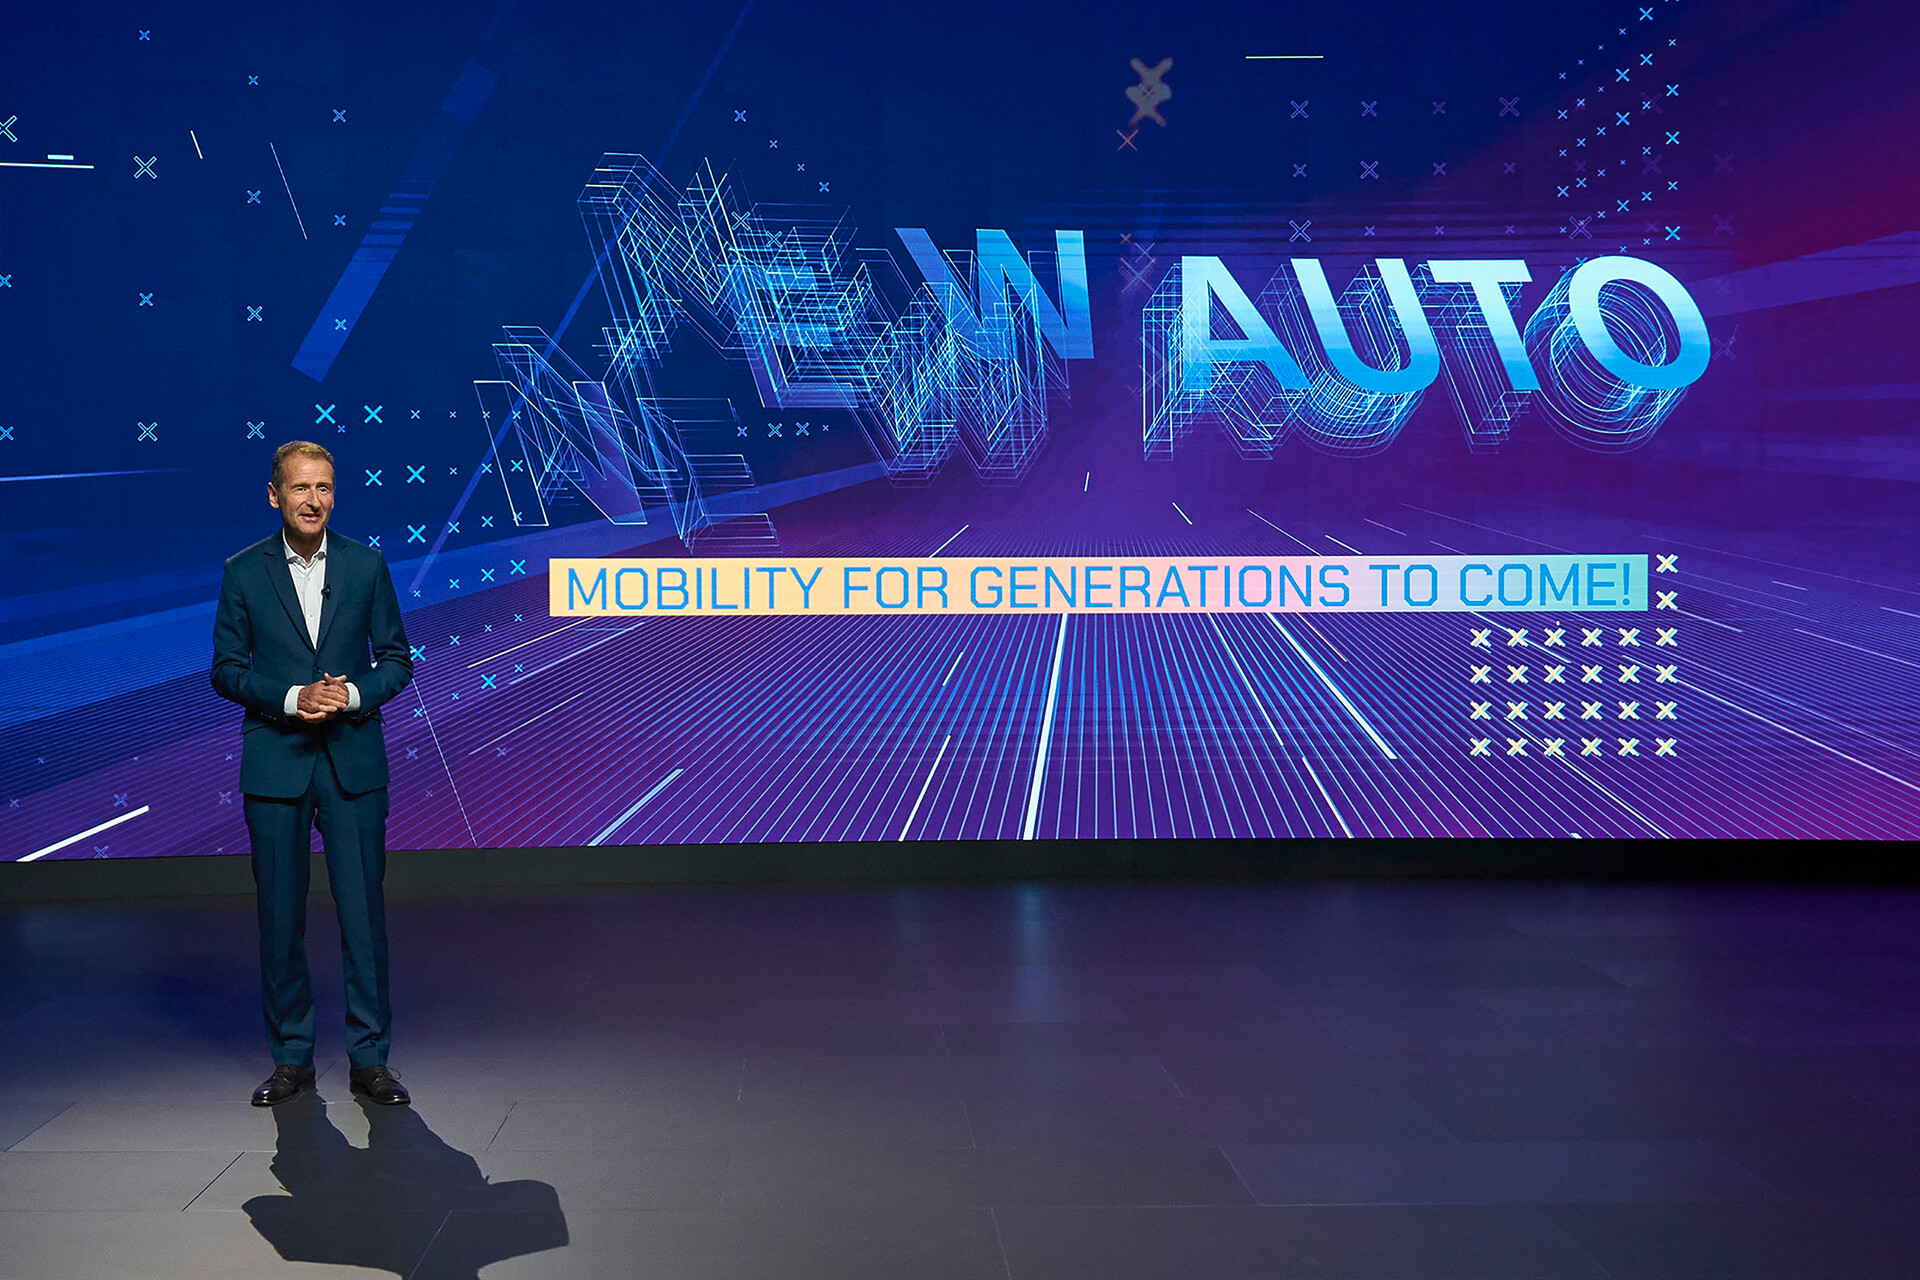 NEW AUTO STRATEGY - CEO HERBERT DIESS